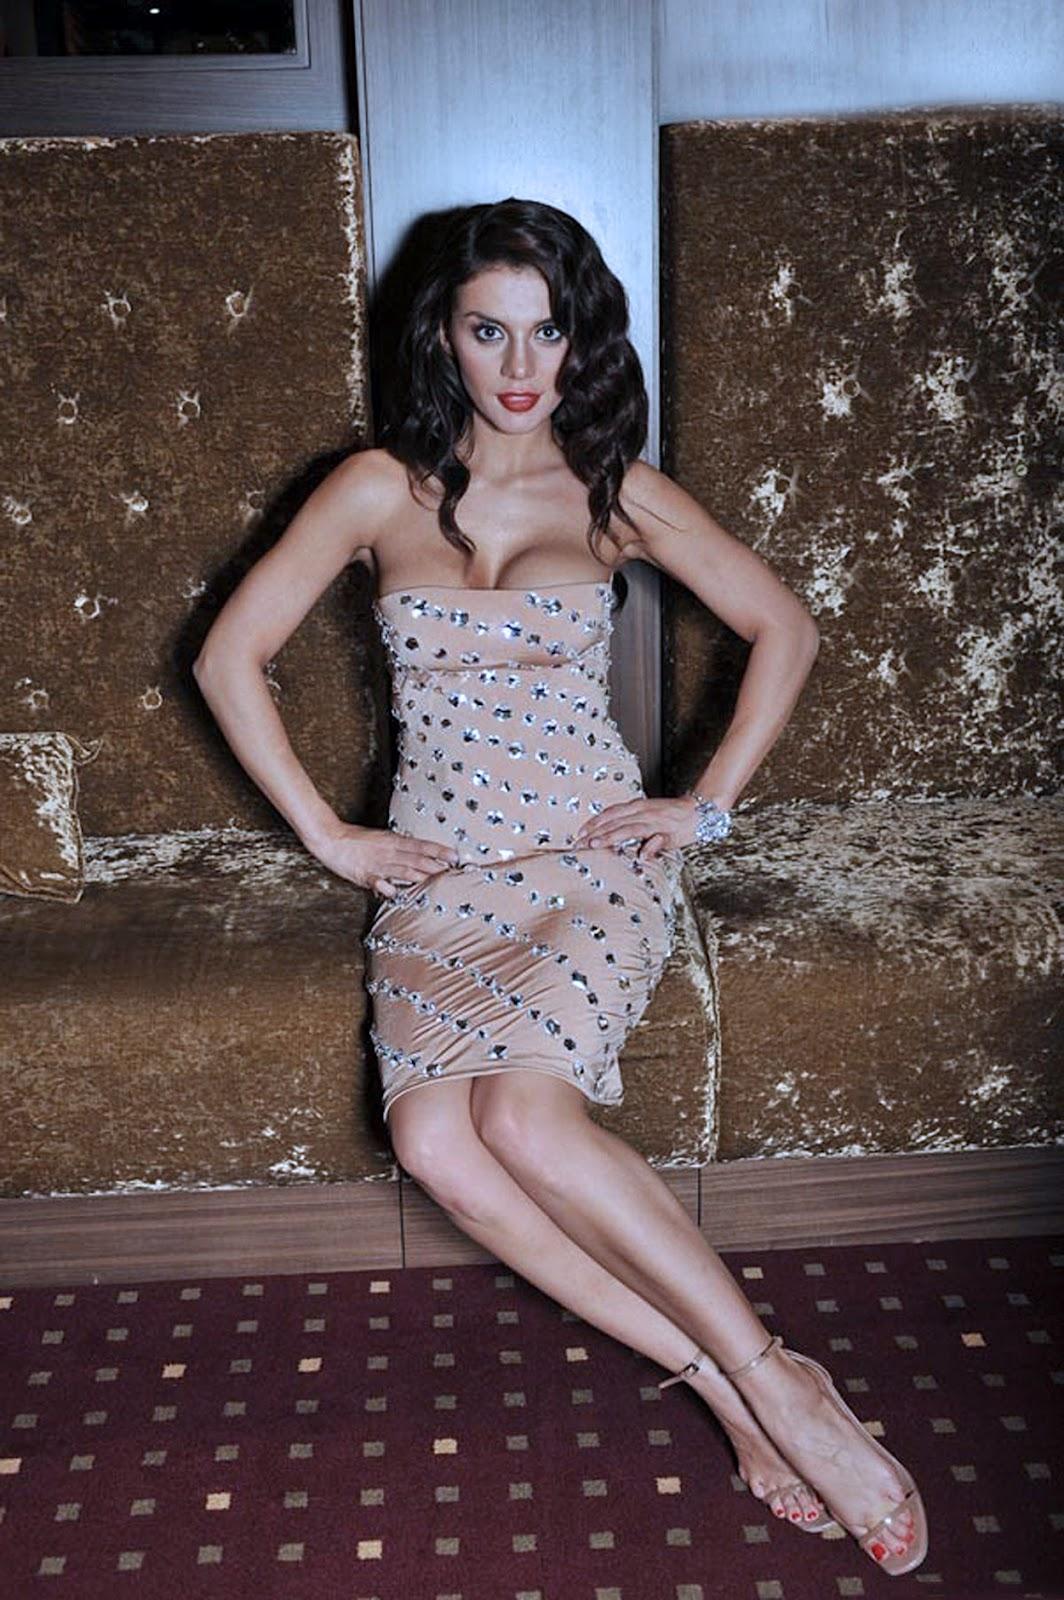 Famous Hot Ukrainian Singer Anna Sedokova